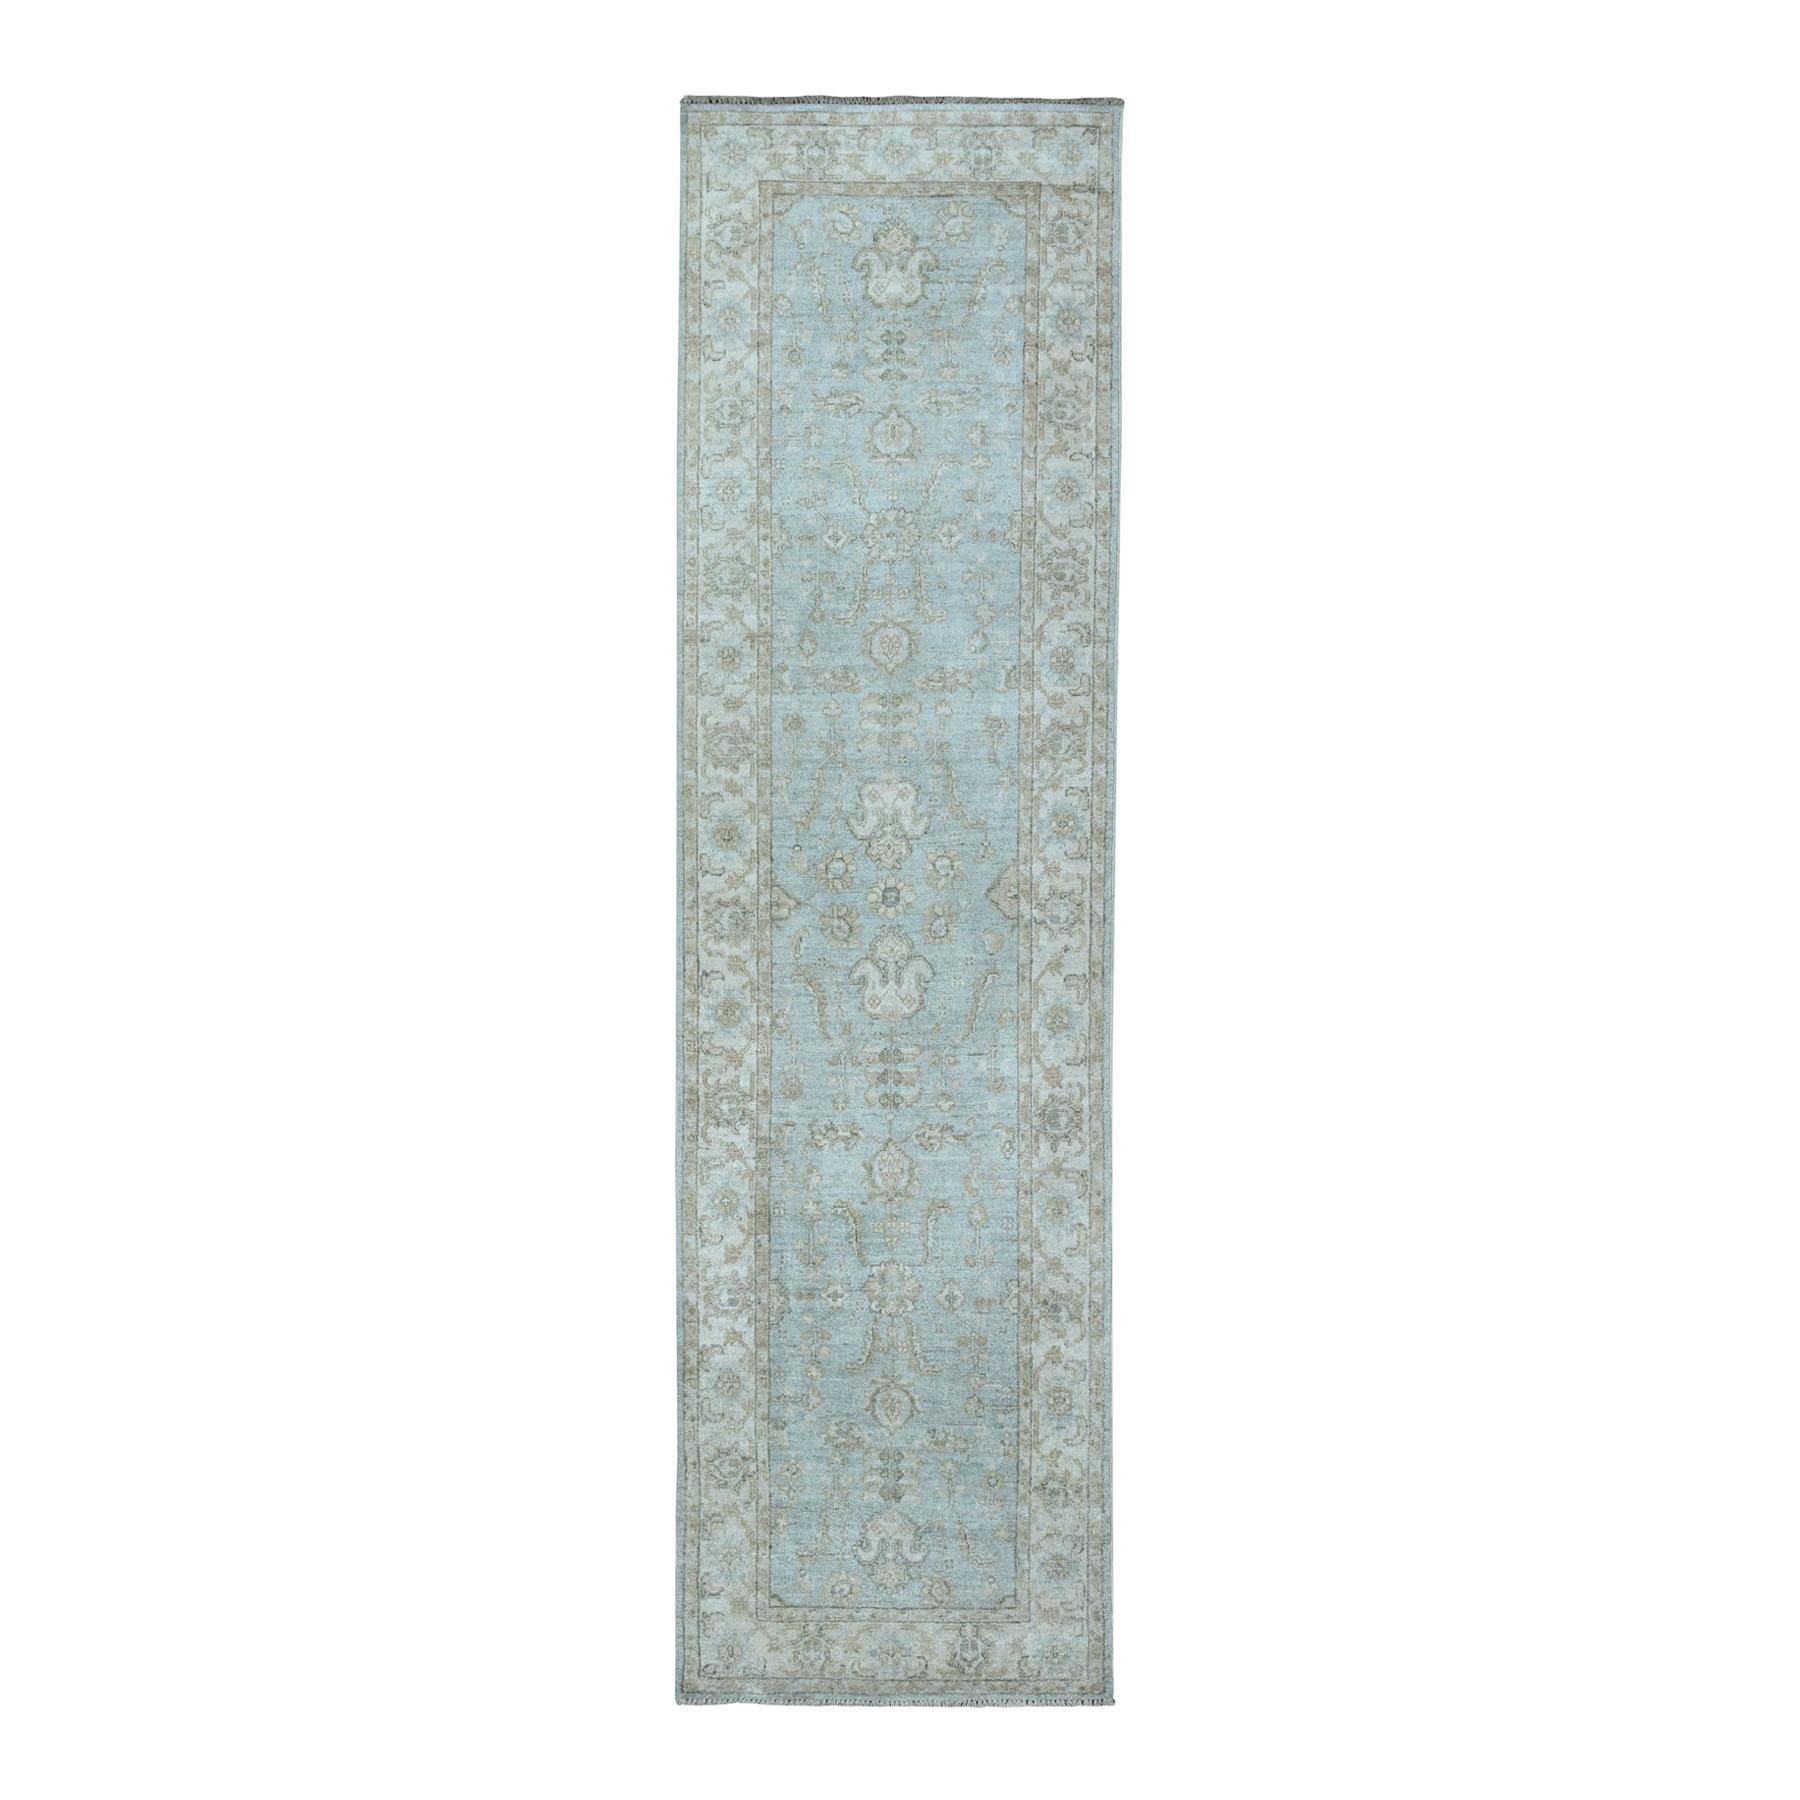 "2'7""x9'9"" White Wash Peshawar Pure Wool Hand-Knotted Runner Oriental Rug"